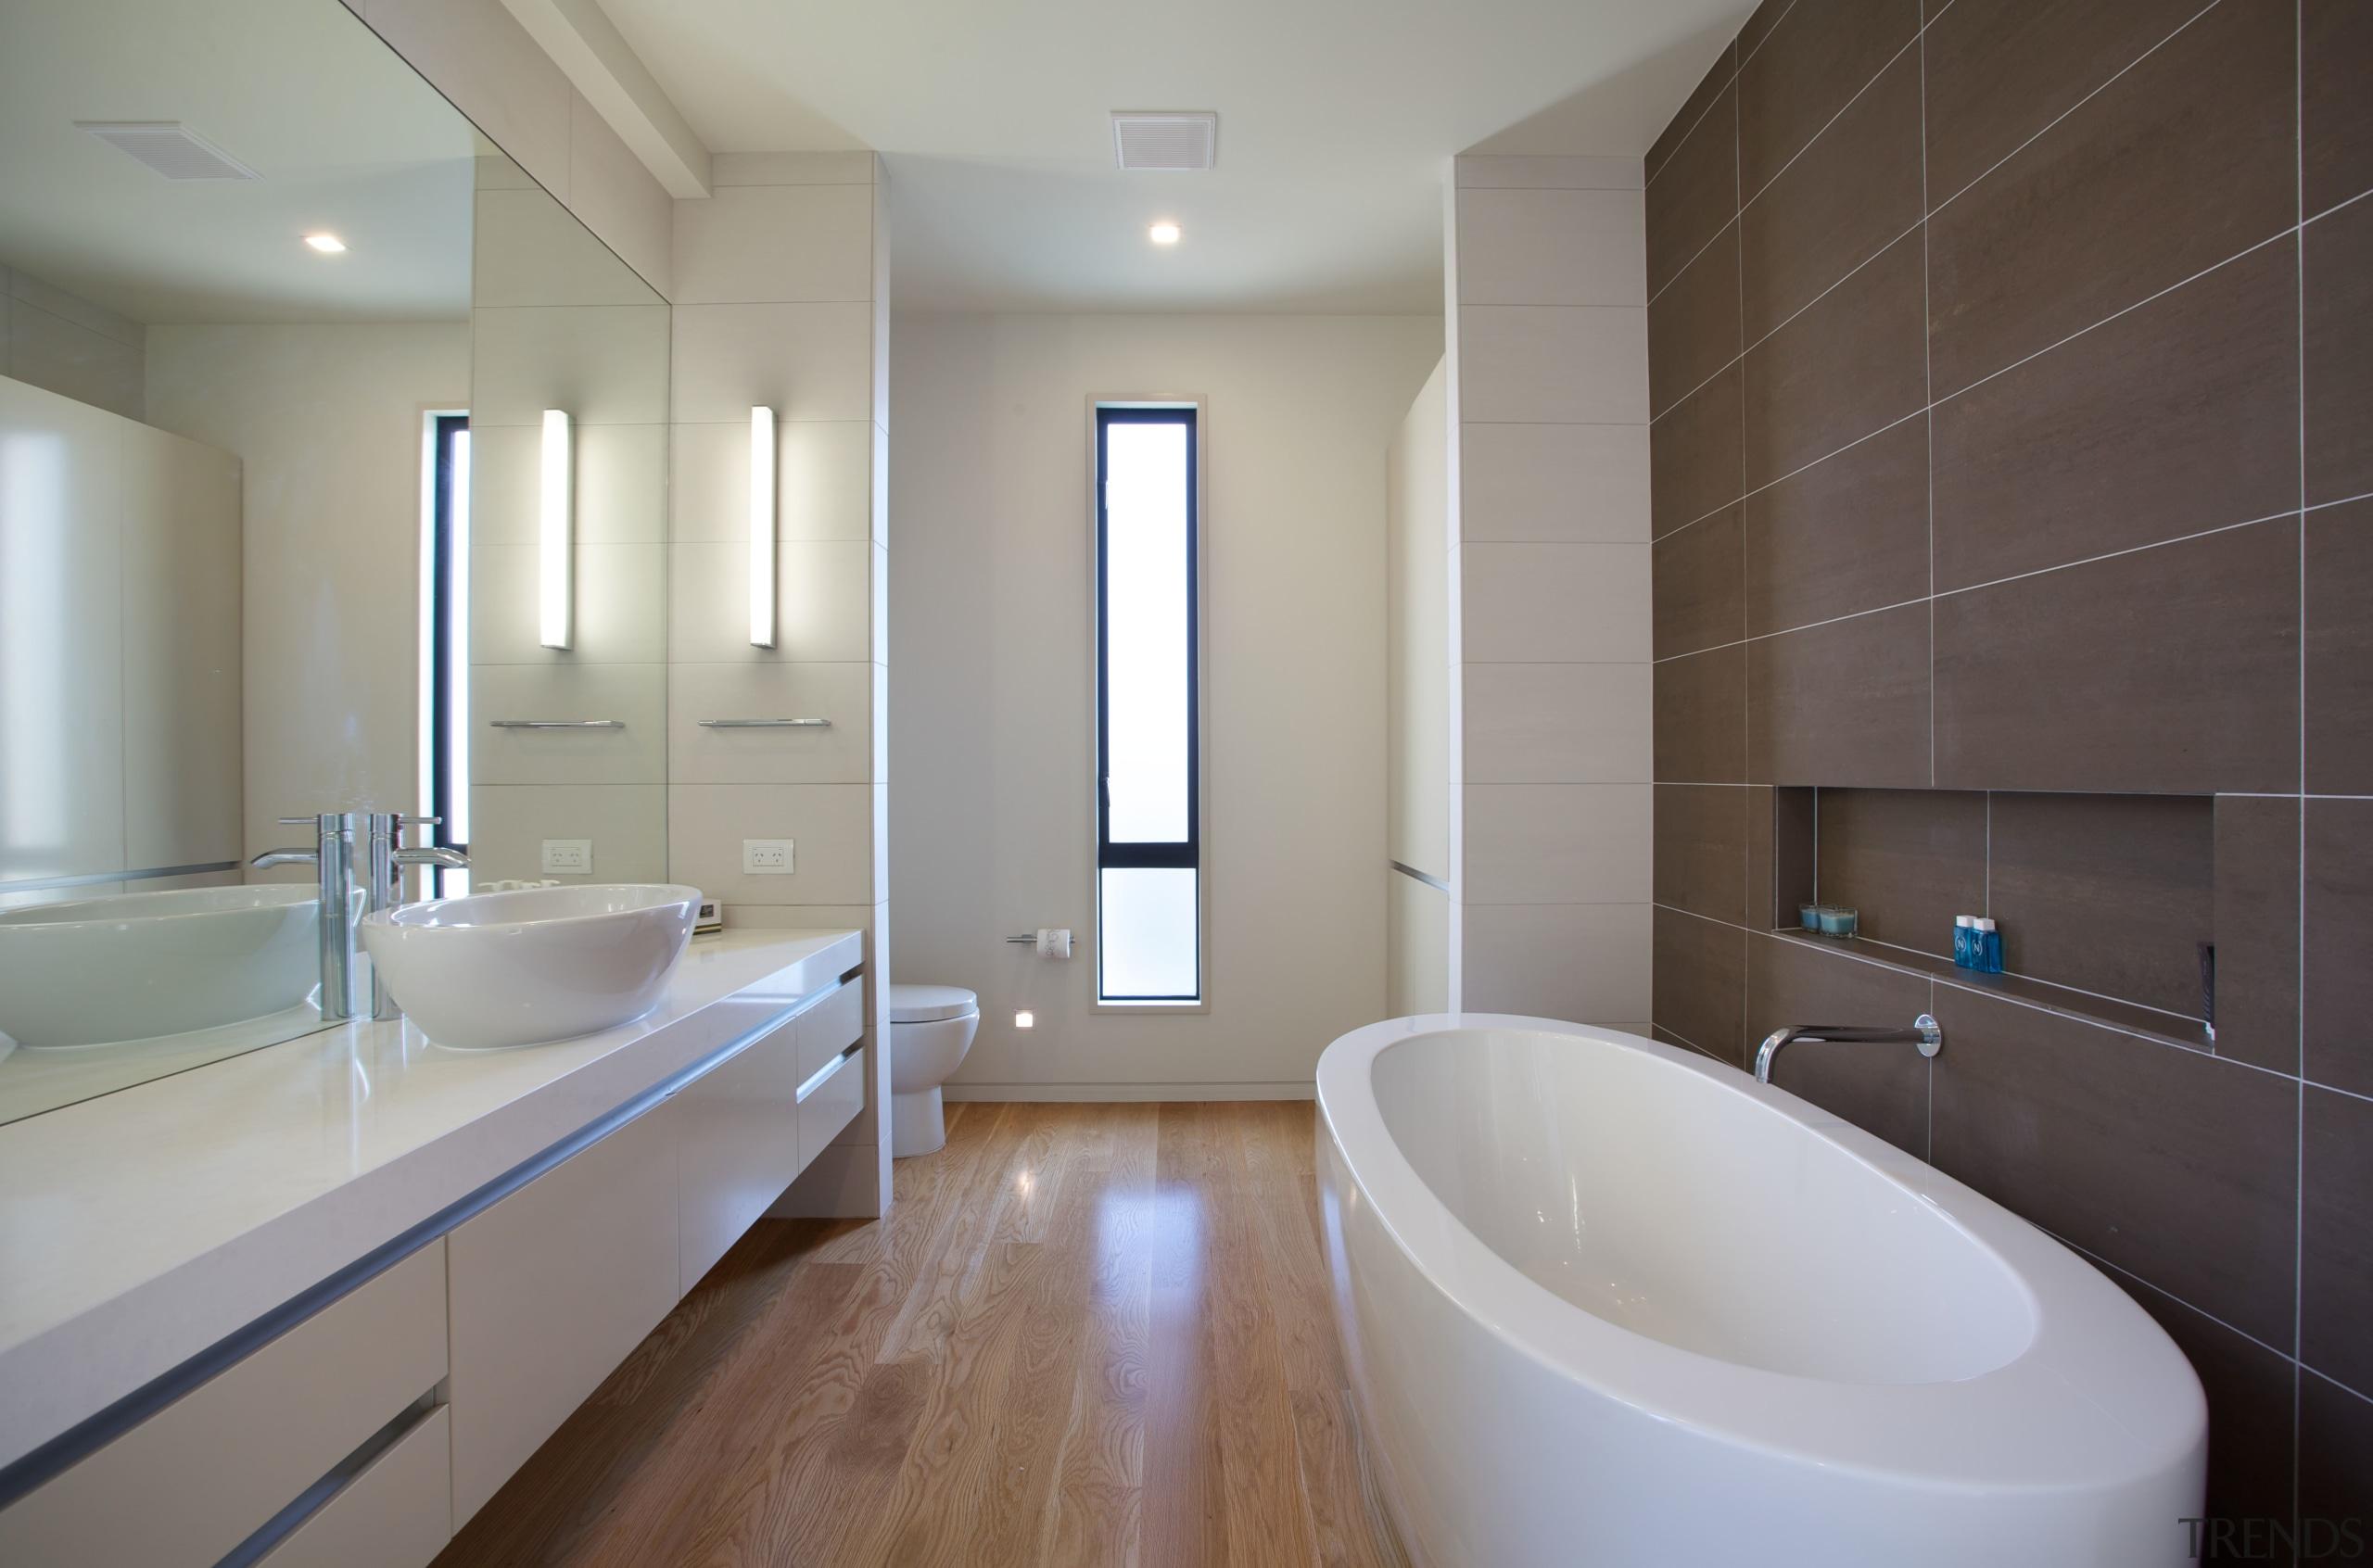 Resort-style contemporary ensuite bathroom - Resort-style contemporary ensuite architecture, bathroom, daylighting, floor, home, interior design, property, real estate, room, sink, tile, wall, window, gray